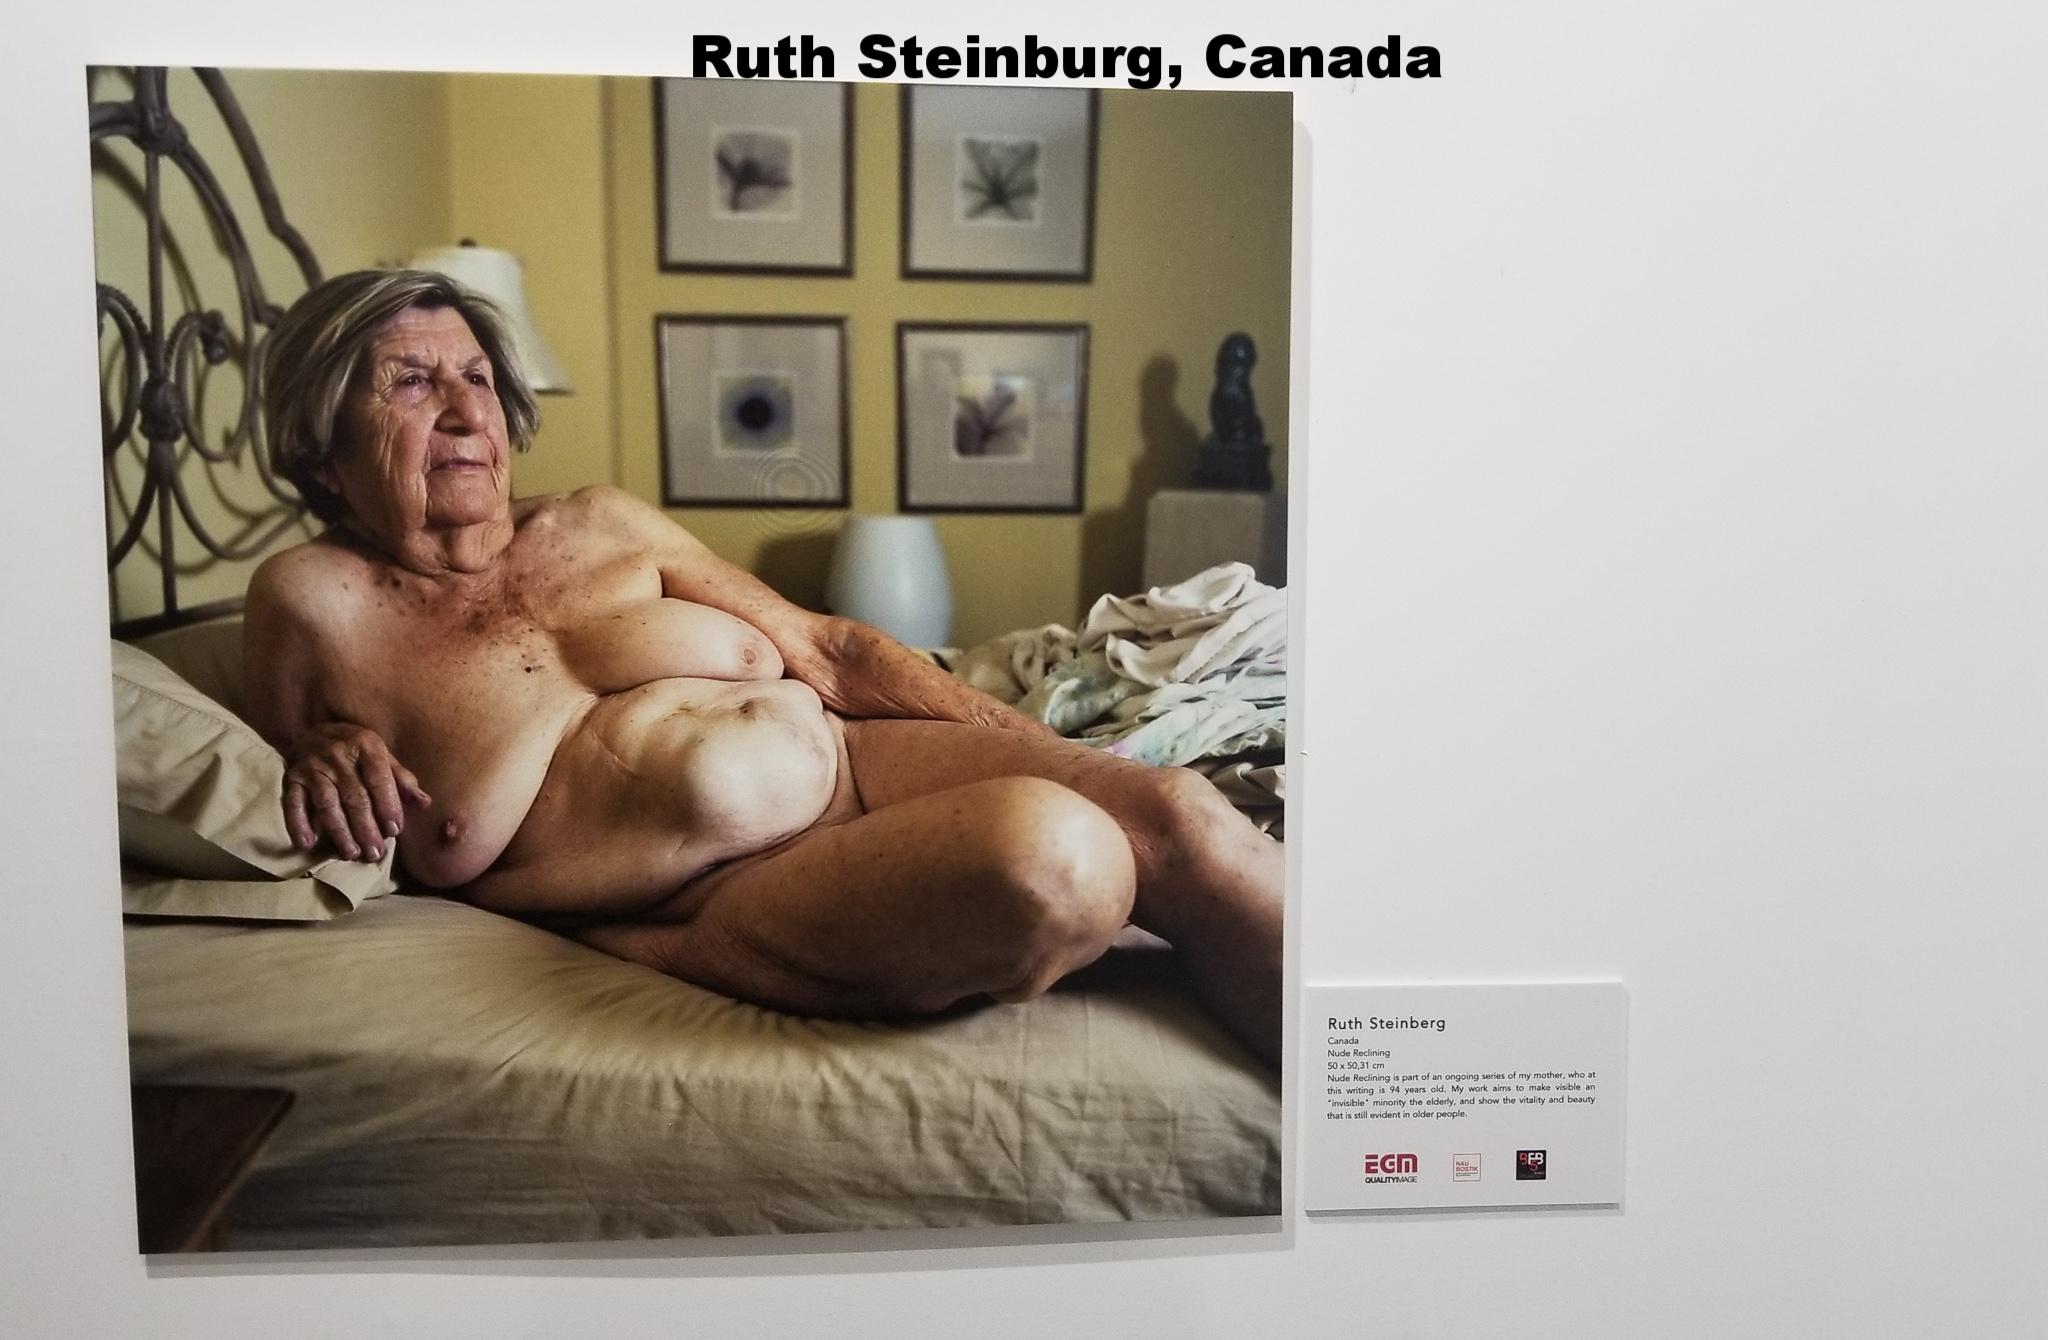 Ruth Steinberg, Canada